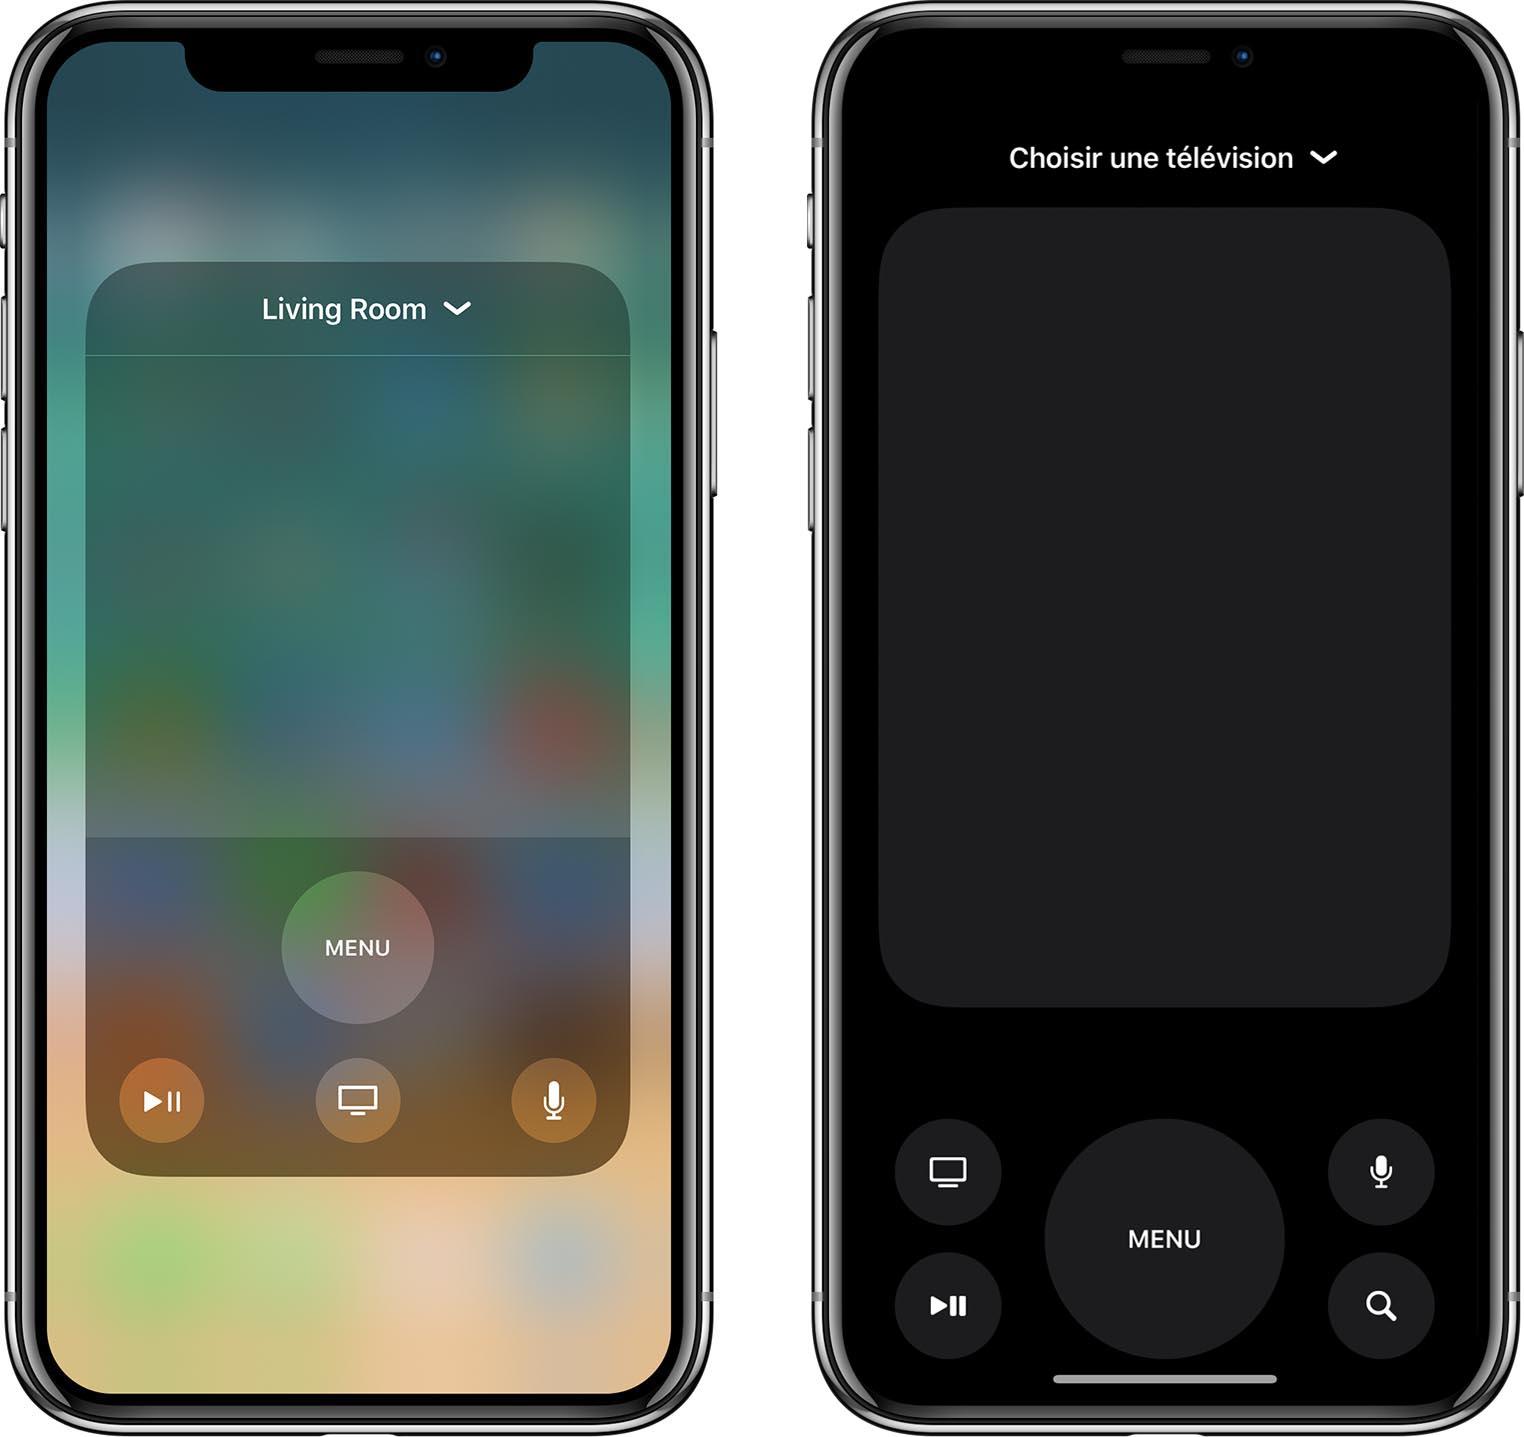 iOS 12.2 Apple TV Remote